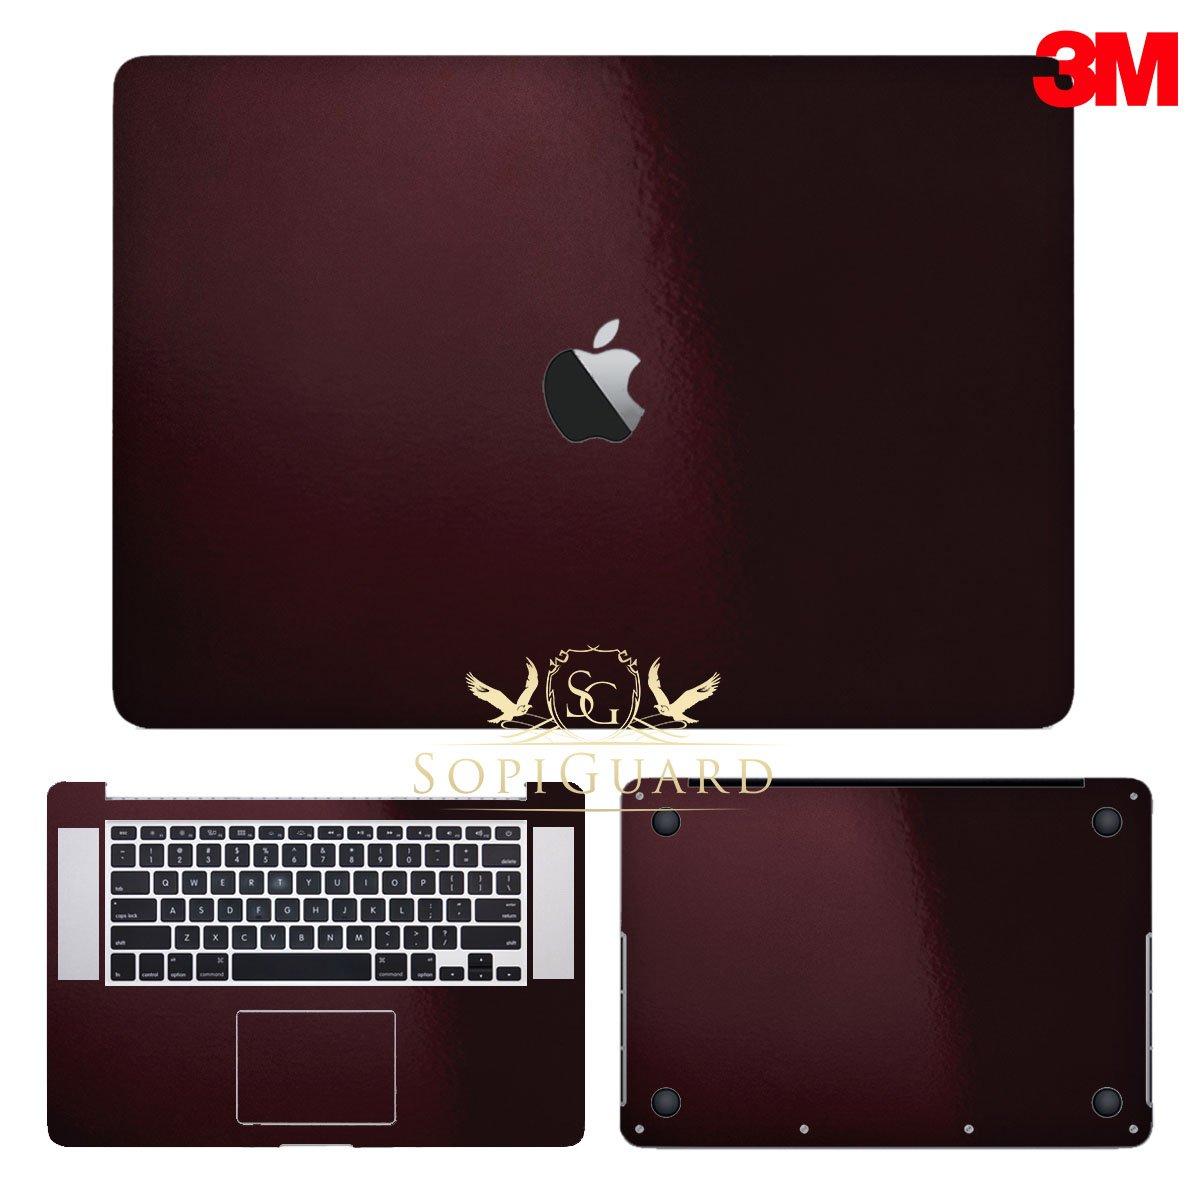 SopiGuard 3M Gloss Black Rose Precision Edge-to-Edge Coverage Vinyl Sticker Skin for Apple Macbook Pro 15 Retina (A1398)